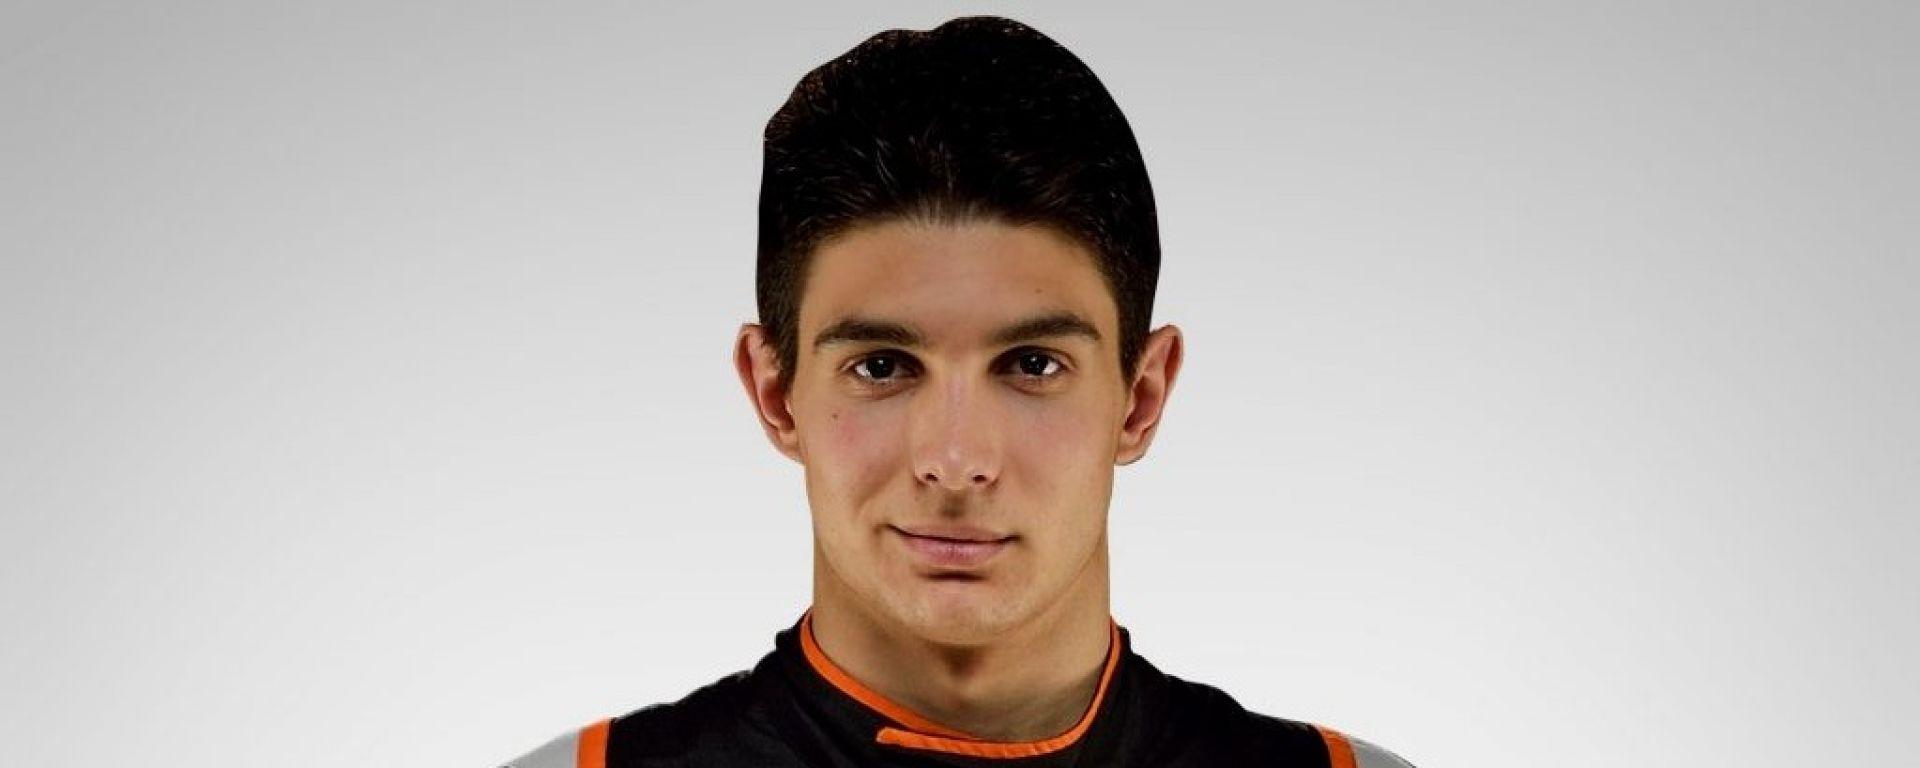 Esteban Ocon #31